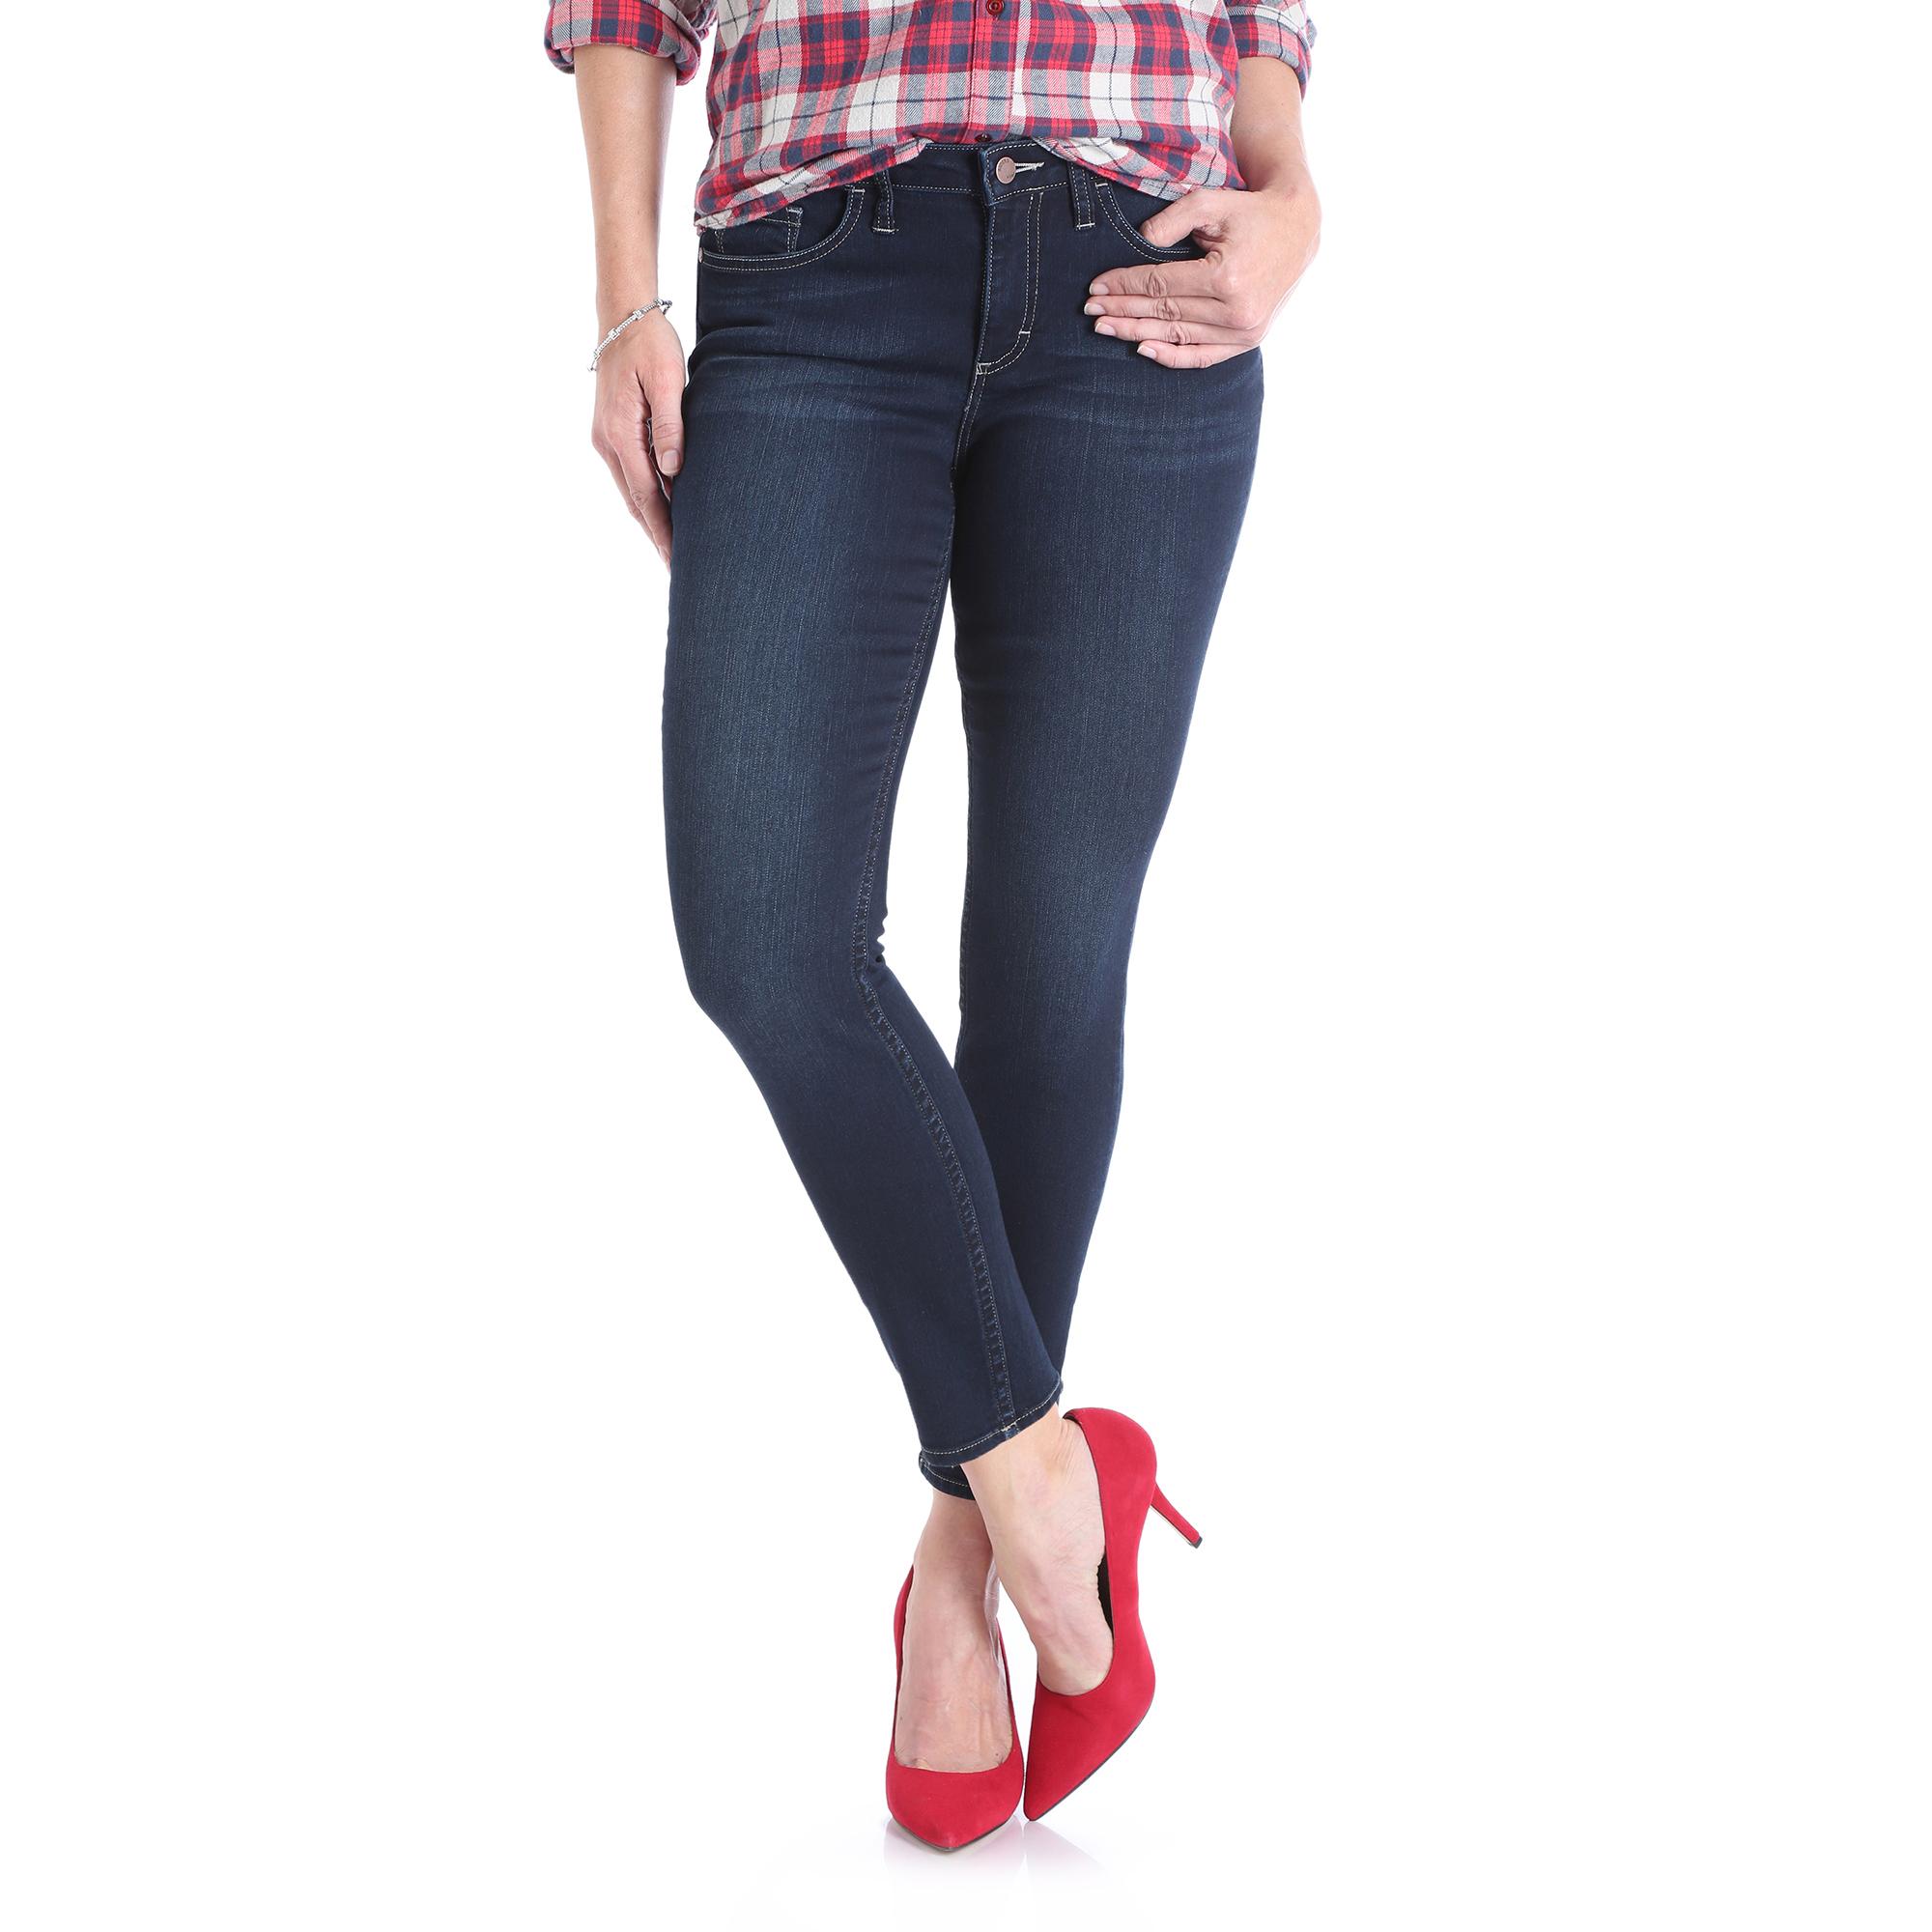 1SMSCW2 - Midrise Skinny Jean